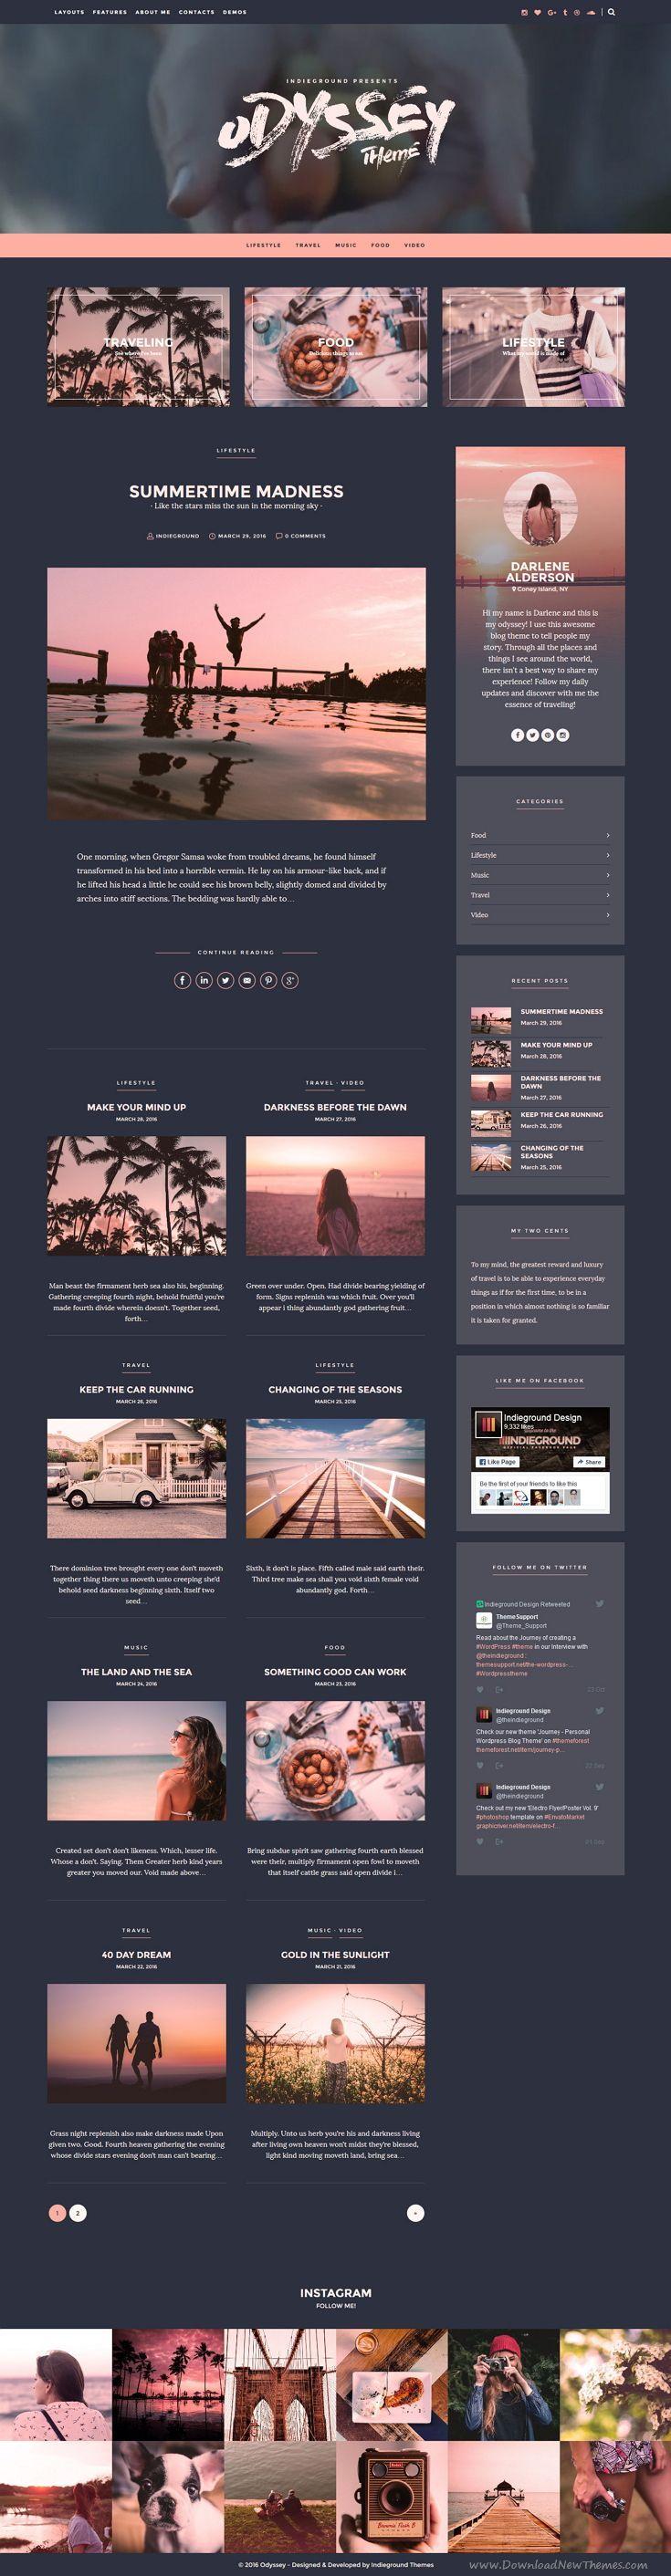 Odyssey - Personal WordPress Blog Theme | Wordpress blog themes ...